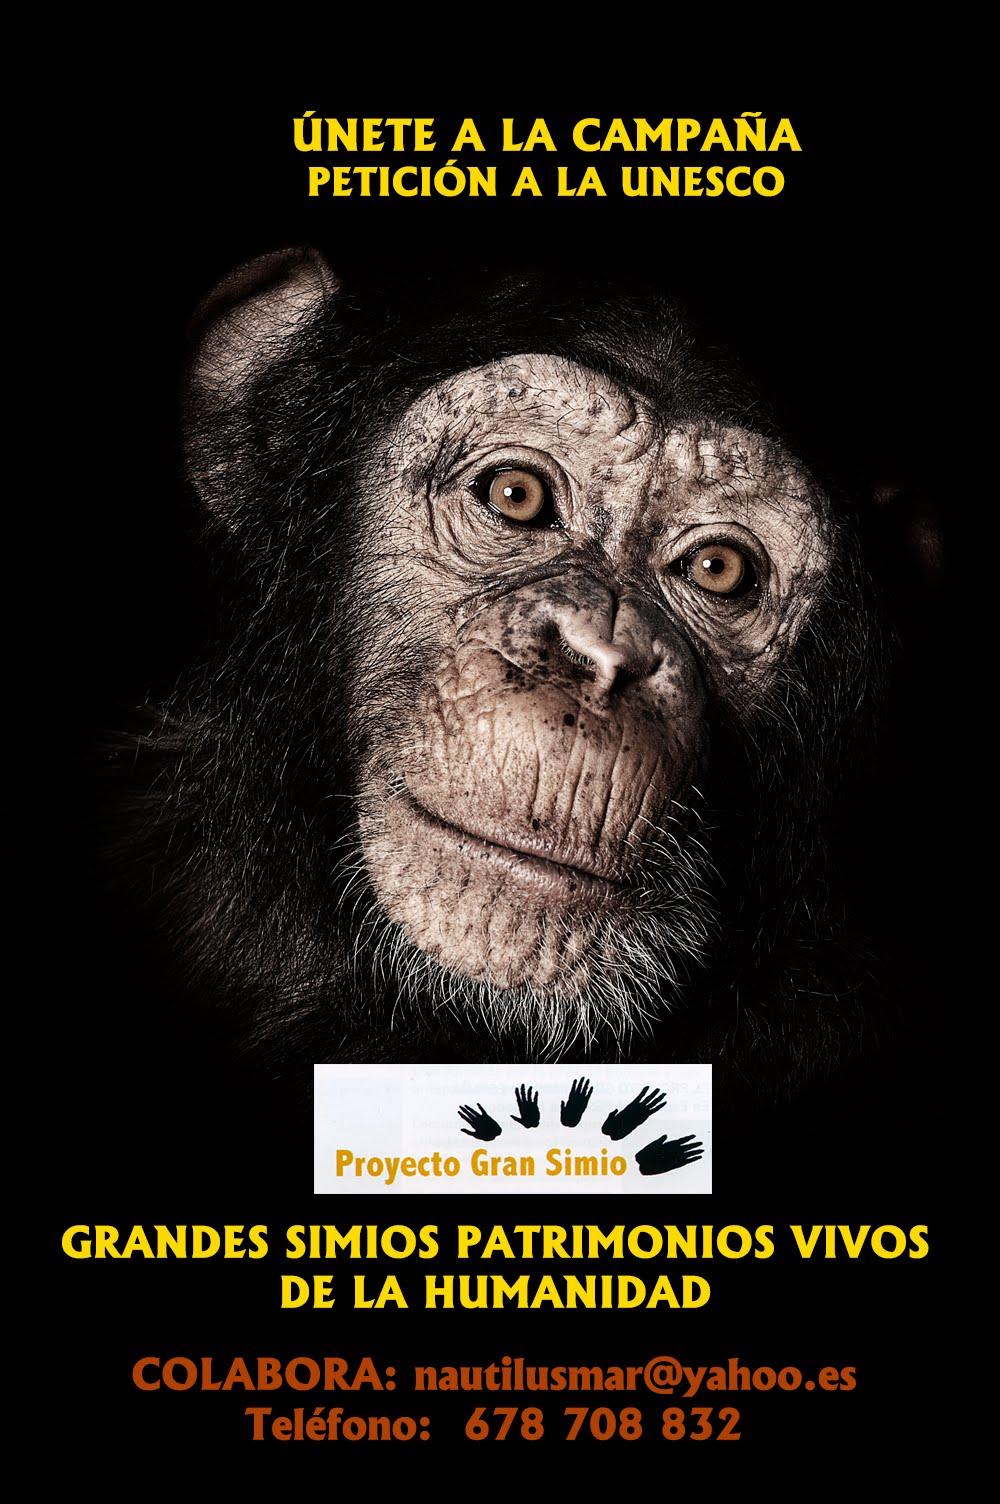 PATRIMONIOS DE LA HUMANIDAD